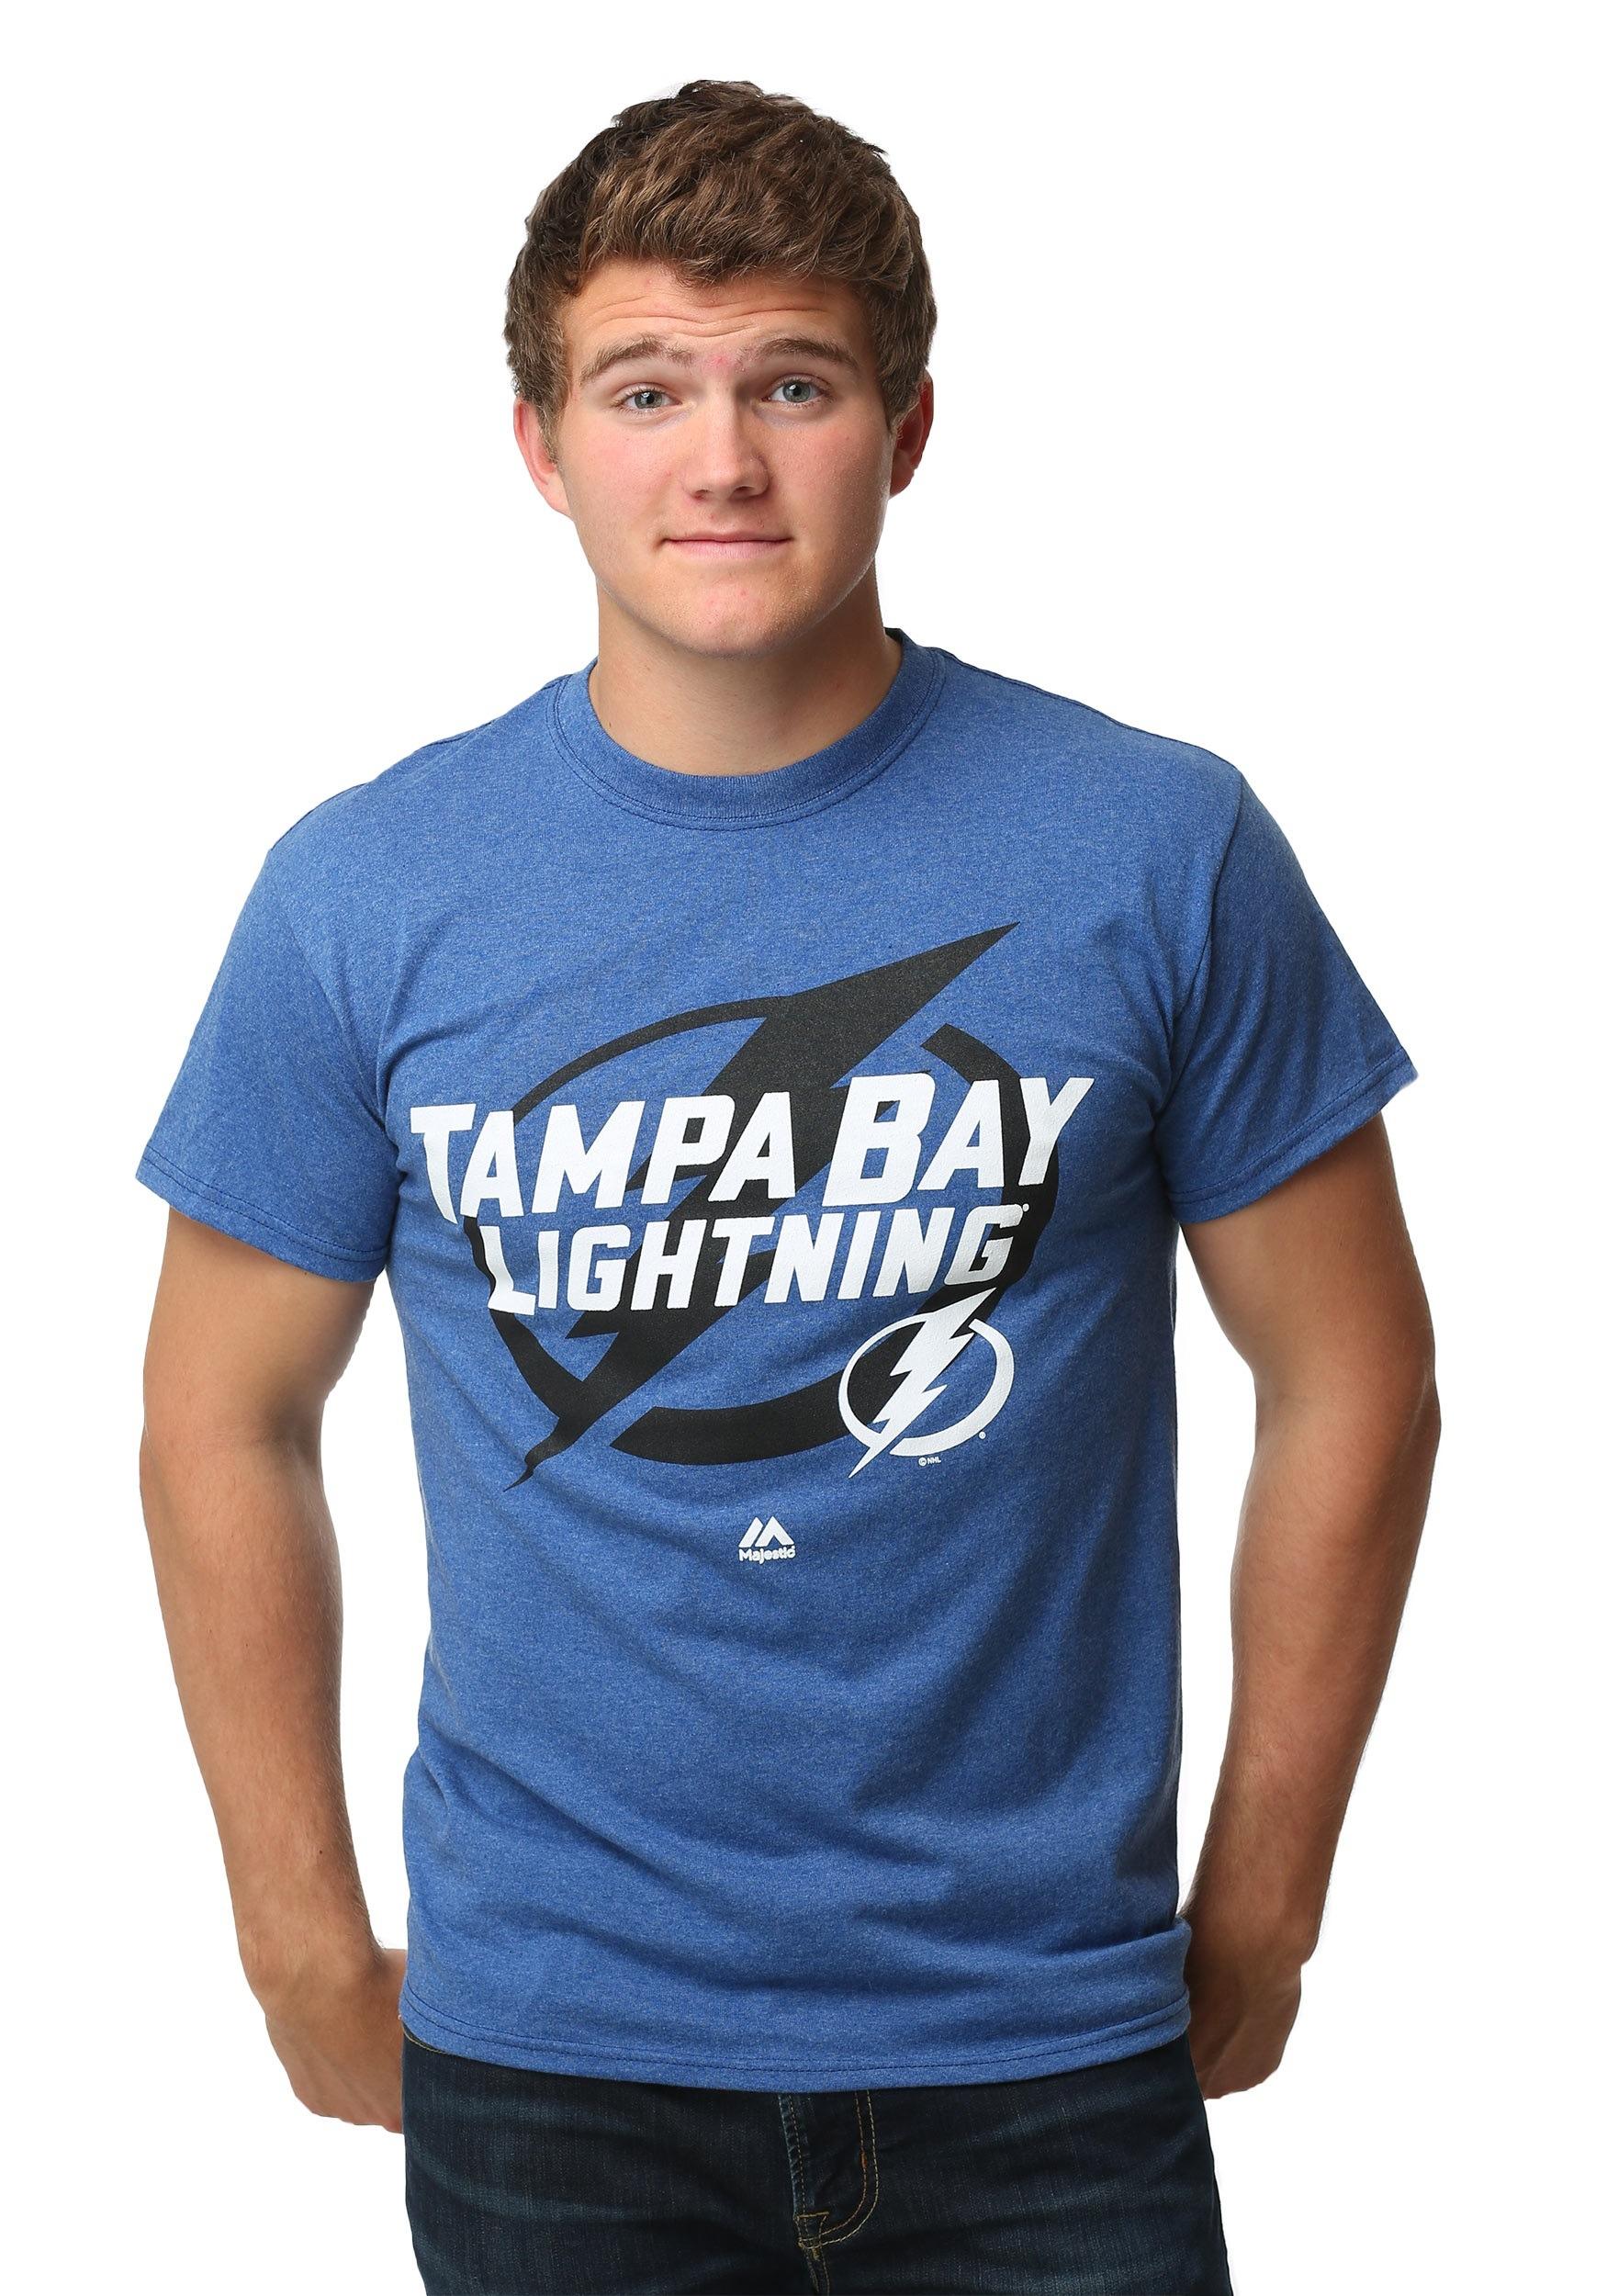 Tampa Bay Lightning Wrist Shot Men's T-Shirt MJM952668A2GKU5E